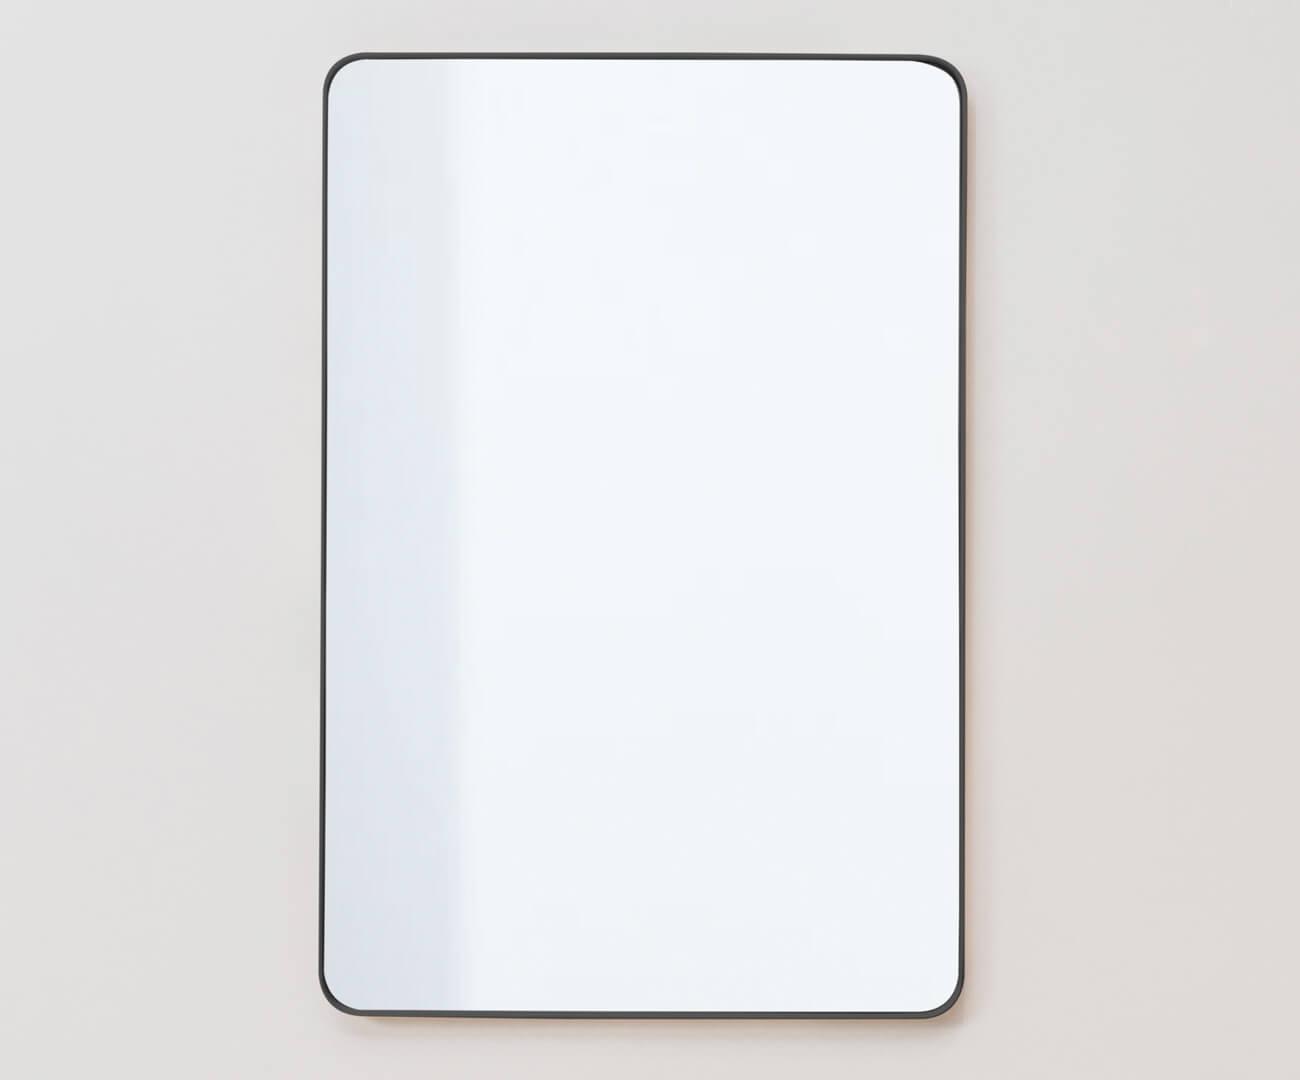 espelho retangular preto ibiza 1133